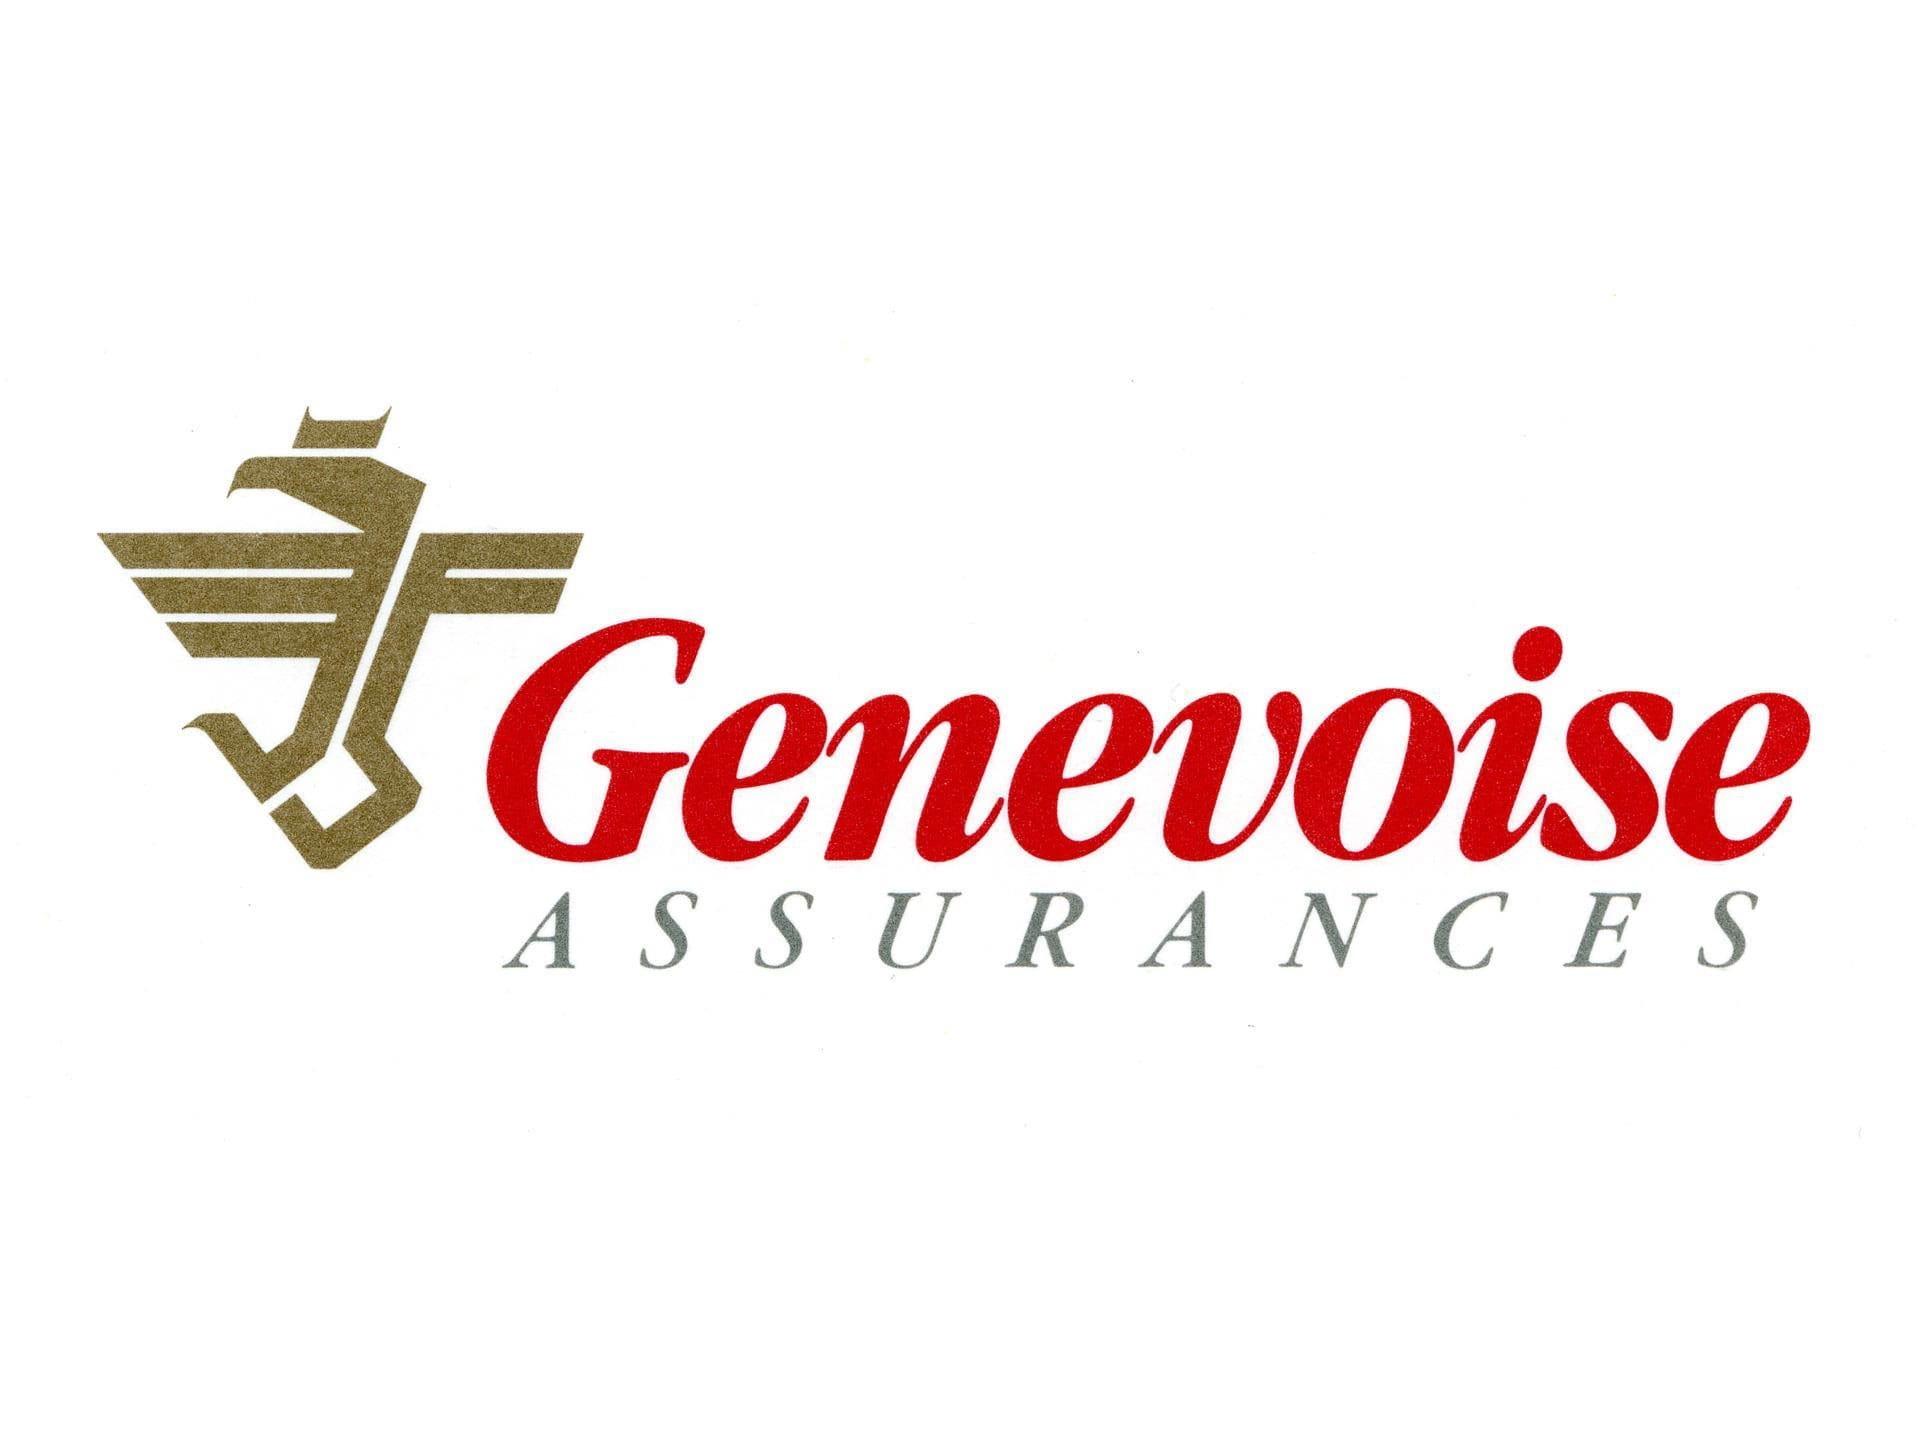 1991: Zurich acquires Genevoise assurance